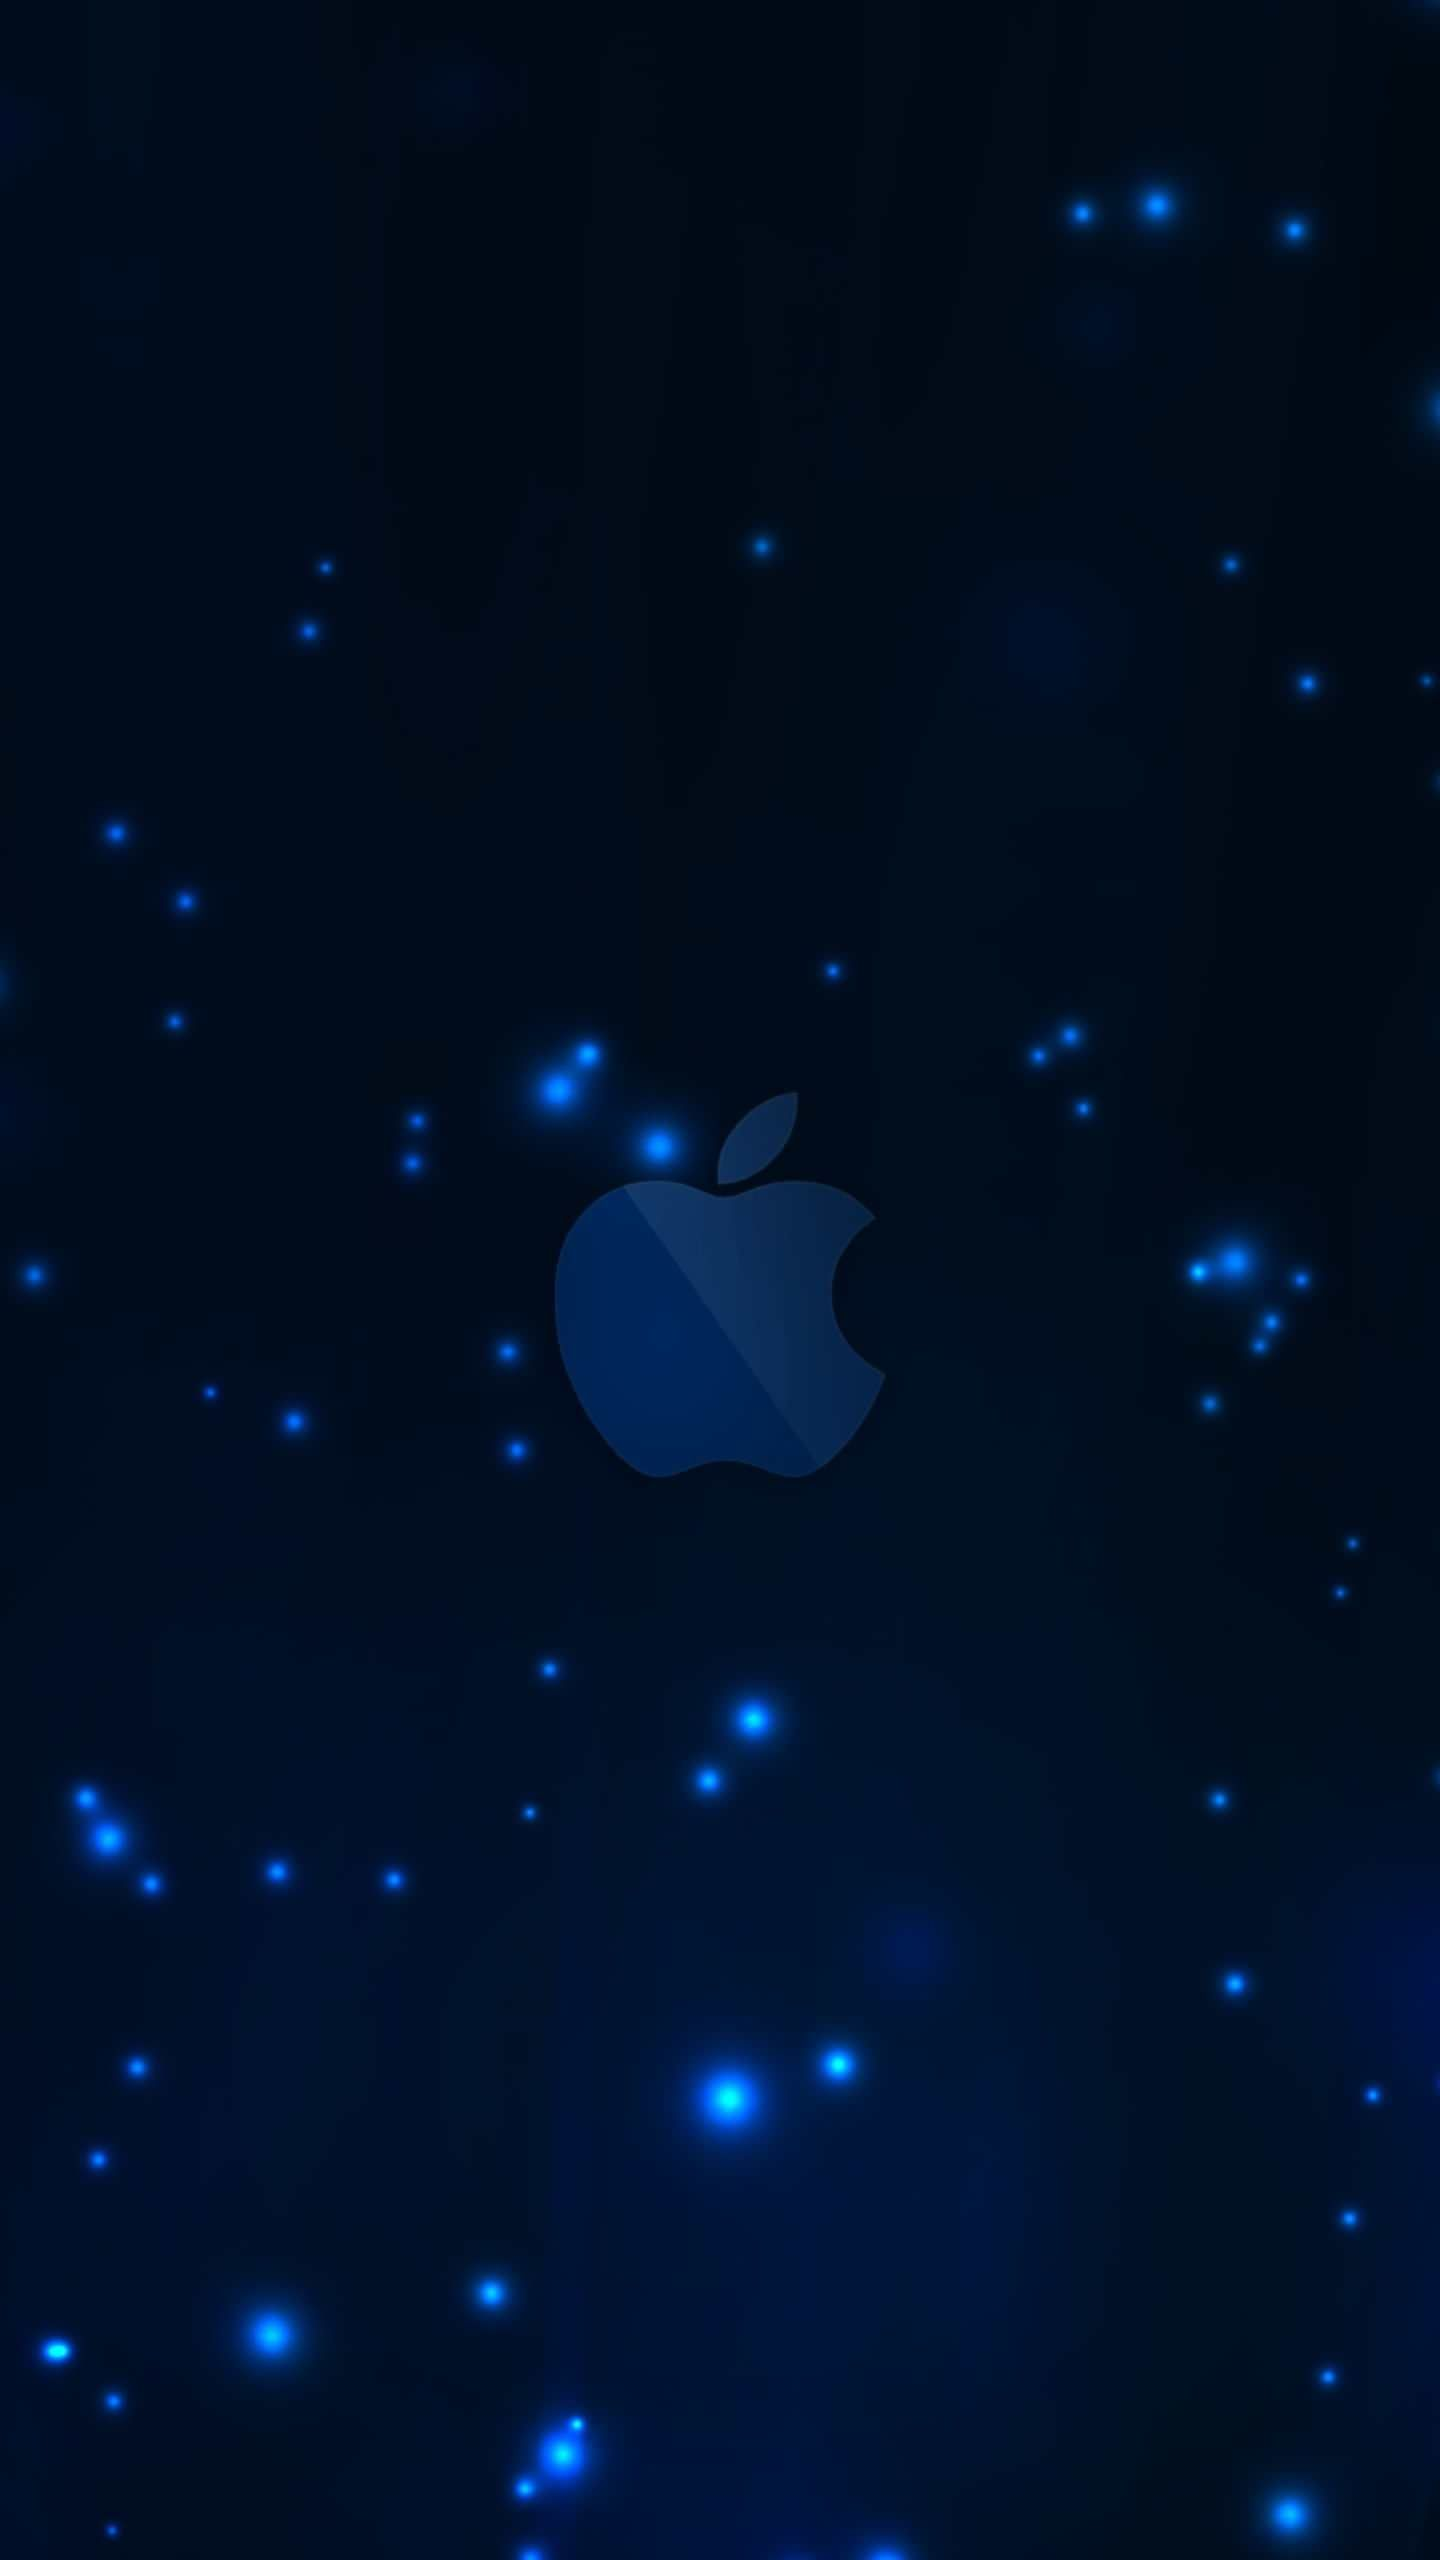 Sky Blue Apple Logo Ipod Wallpaper Apple Wallpaper Apple Logo Wallpaper Iphone